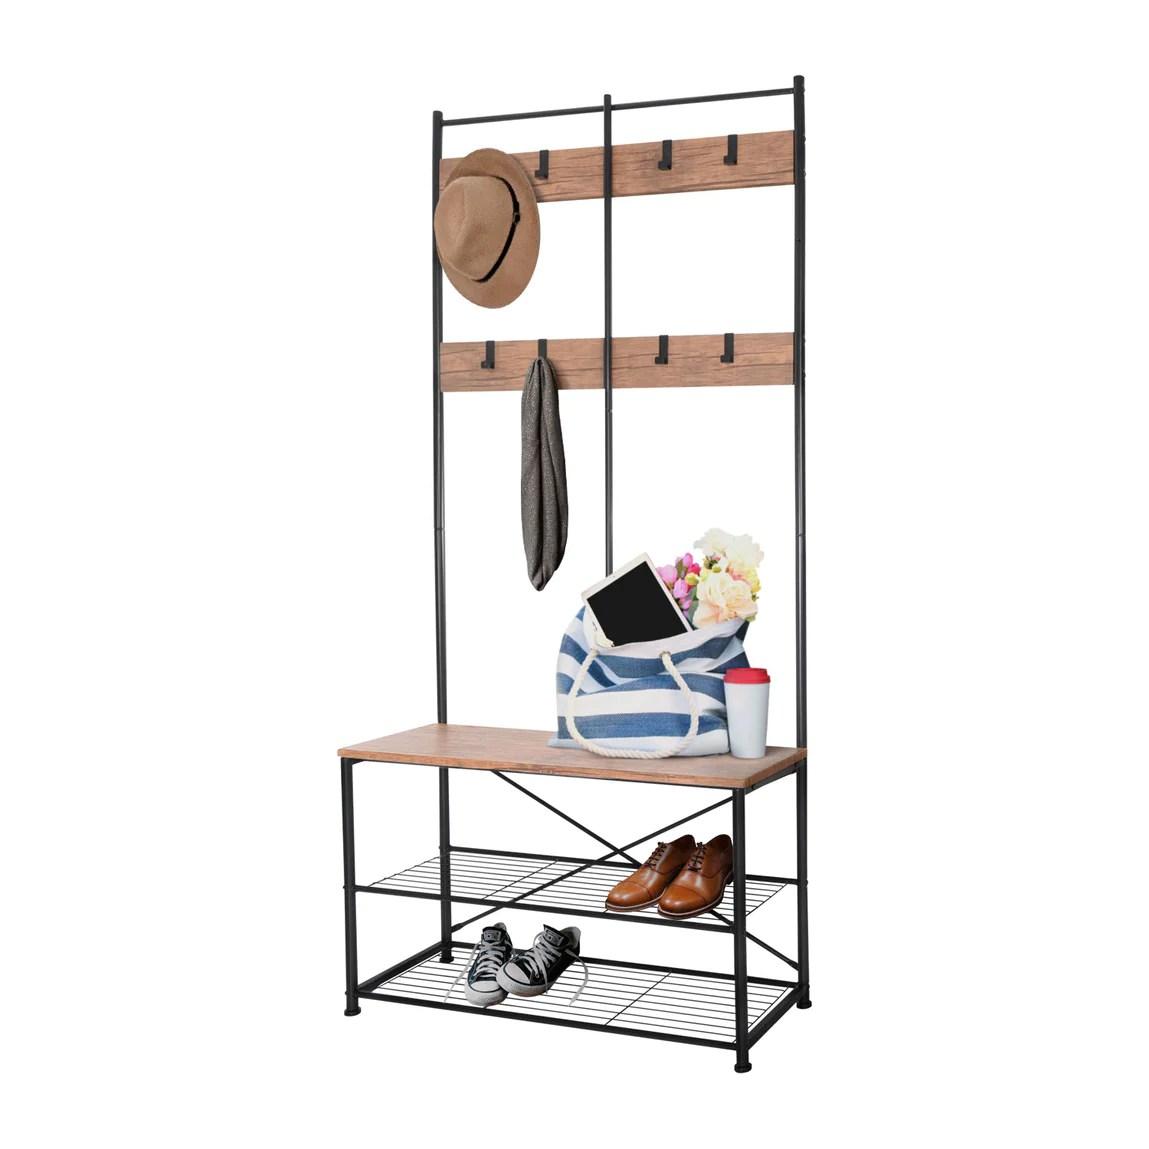 zenvida hall tree entryway bench shoe storage coat rack shelves metal frame